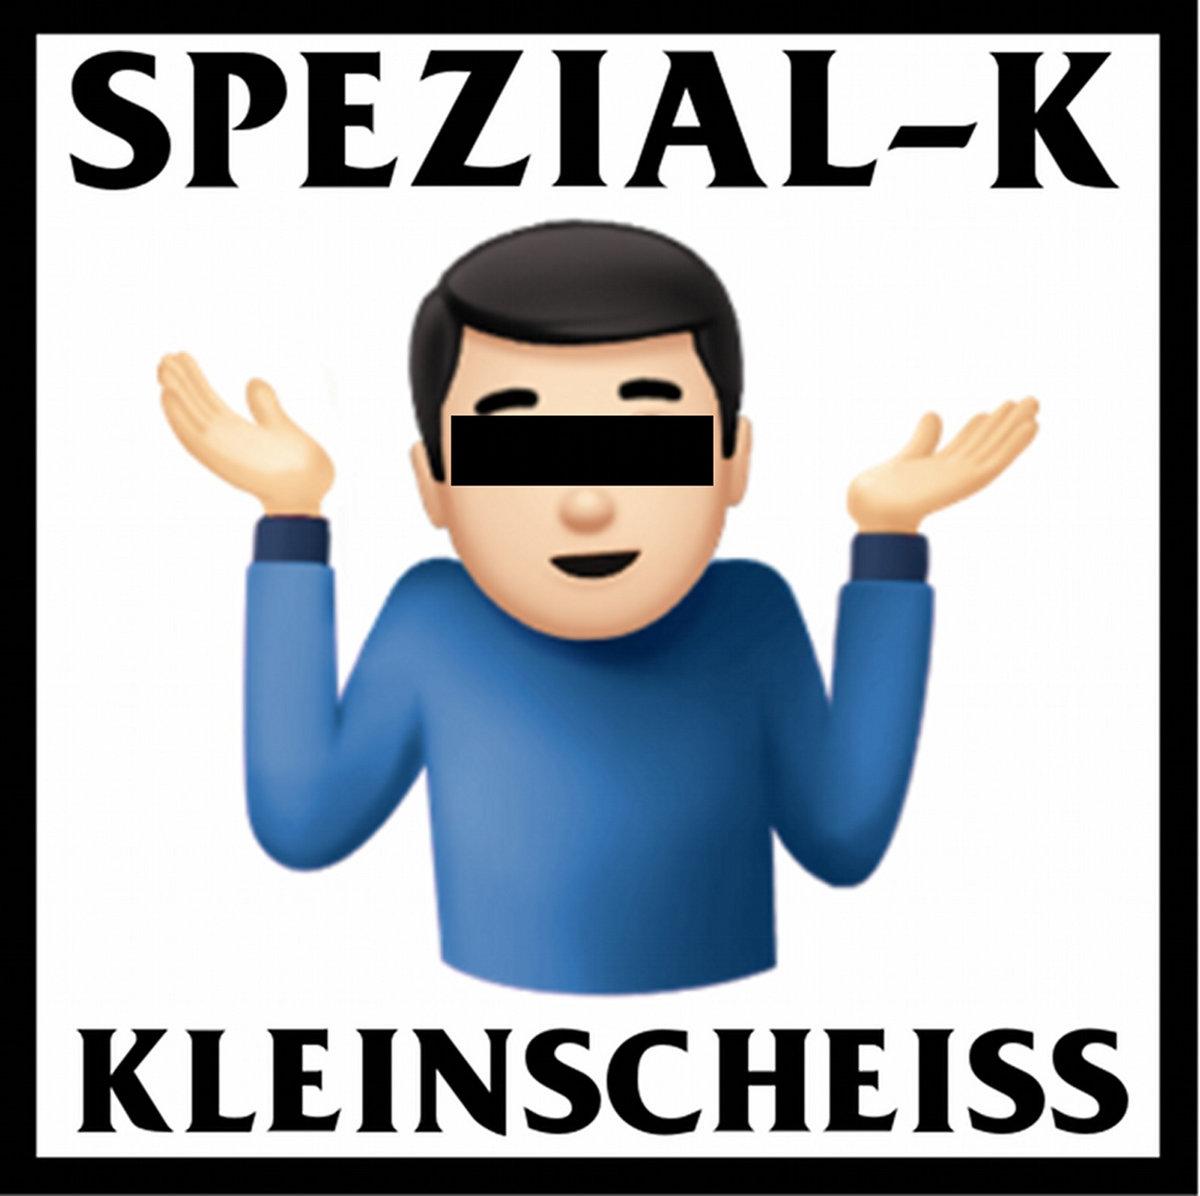 spezial-k